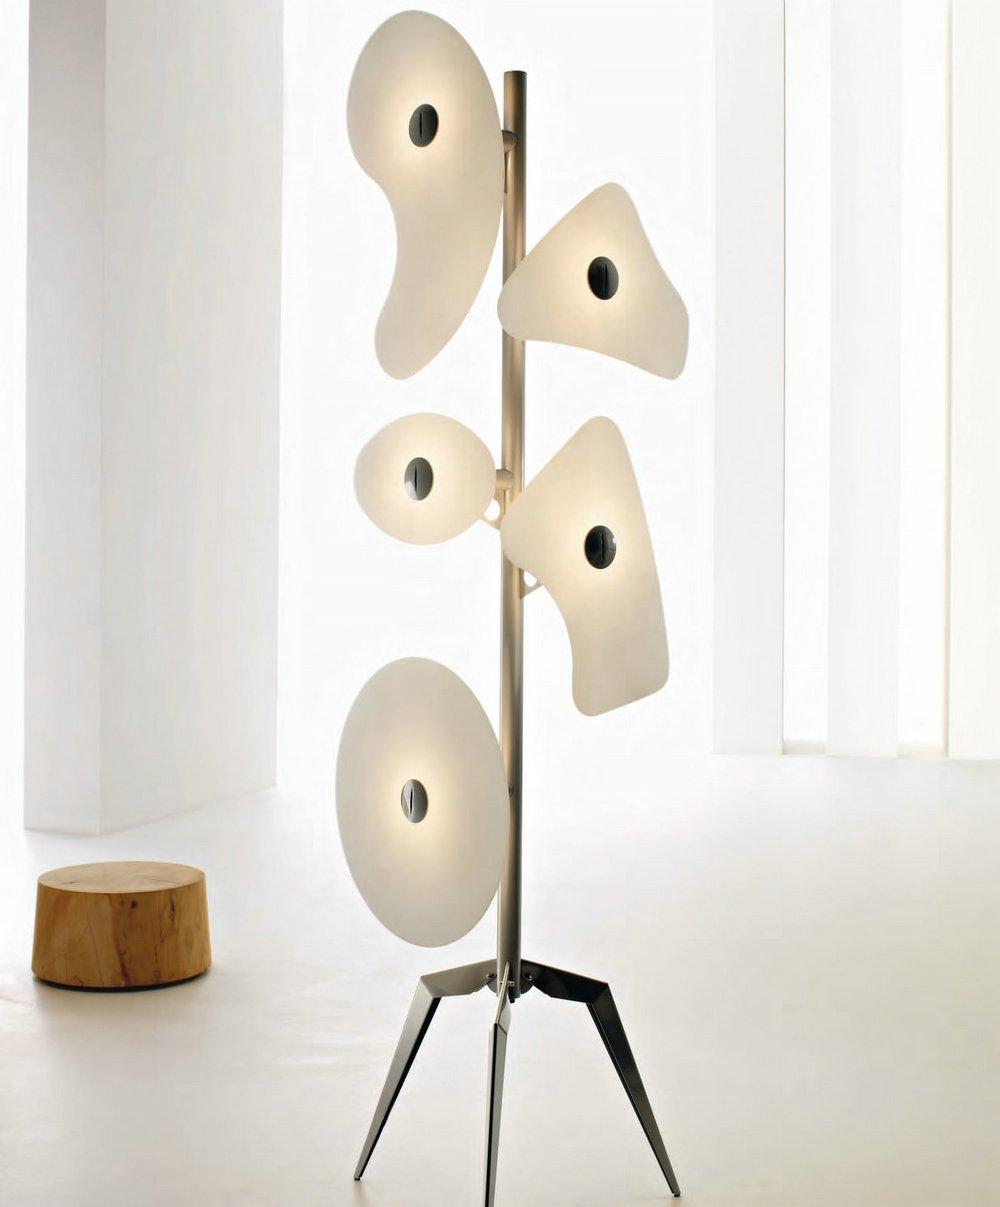 foscarini orbital s lo struktur stehlampe ohne 036s03. Black Bedroom Furniture Sets. Home Design Ideas